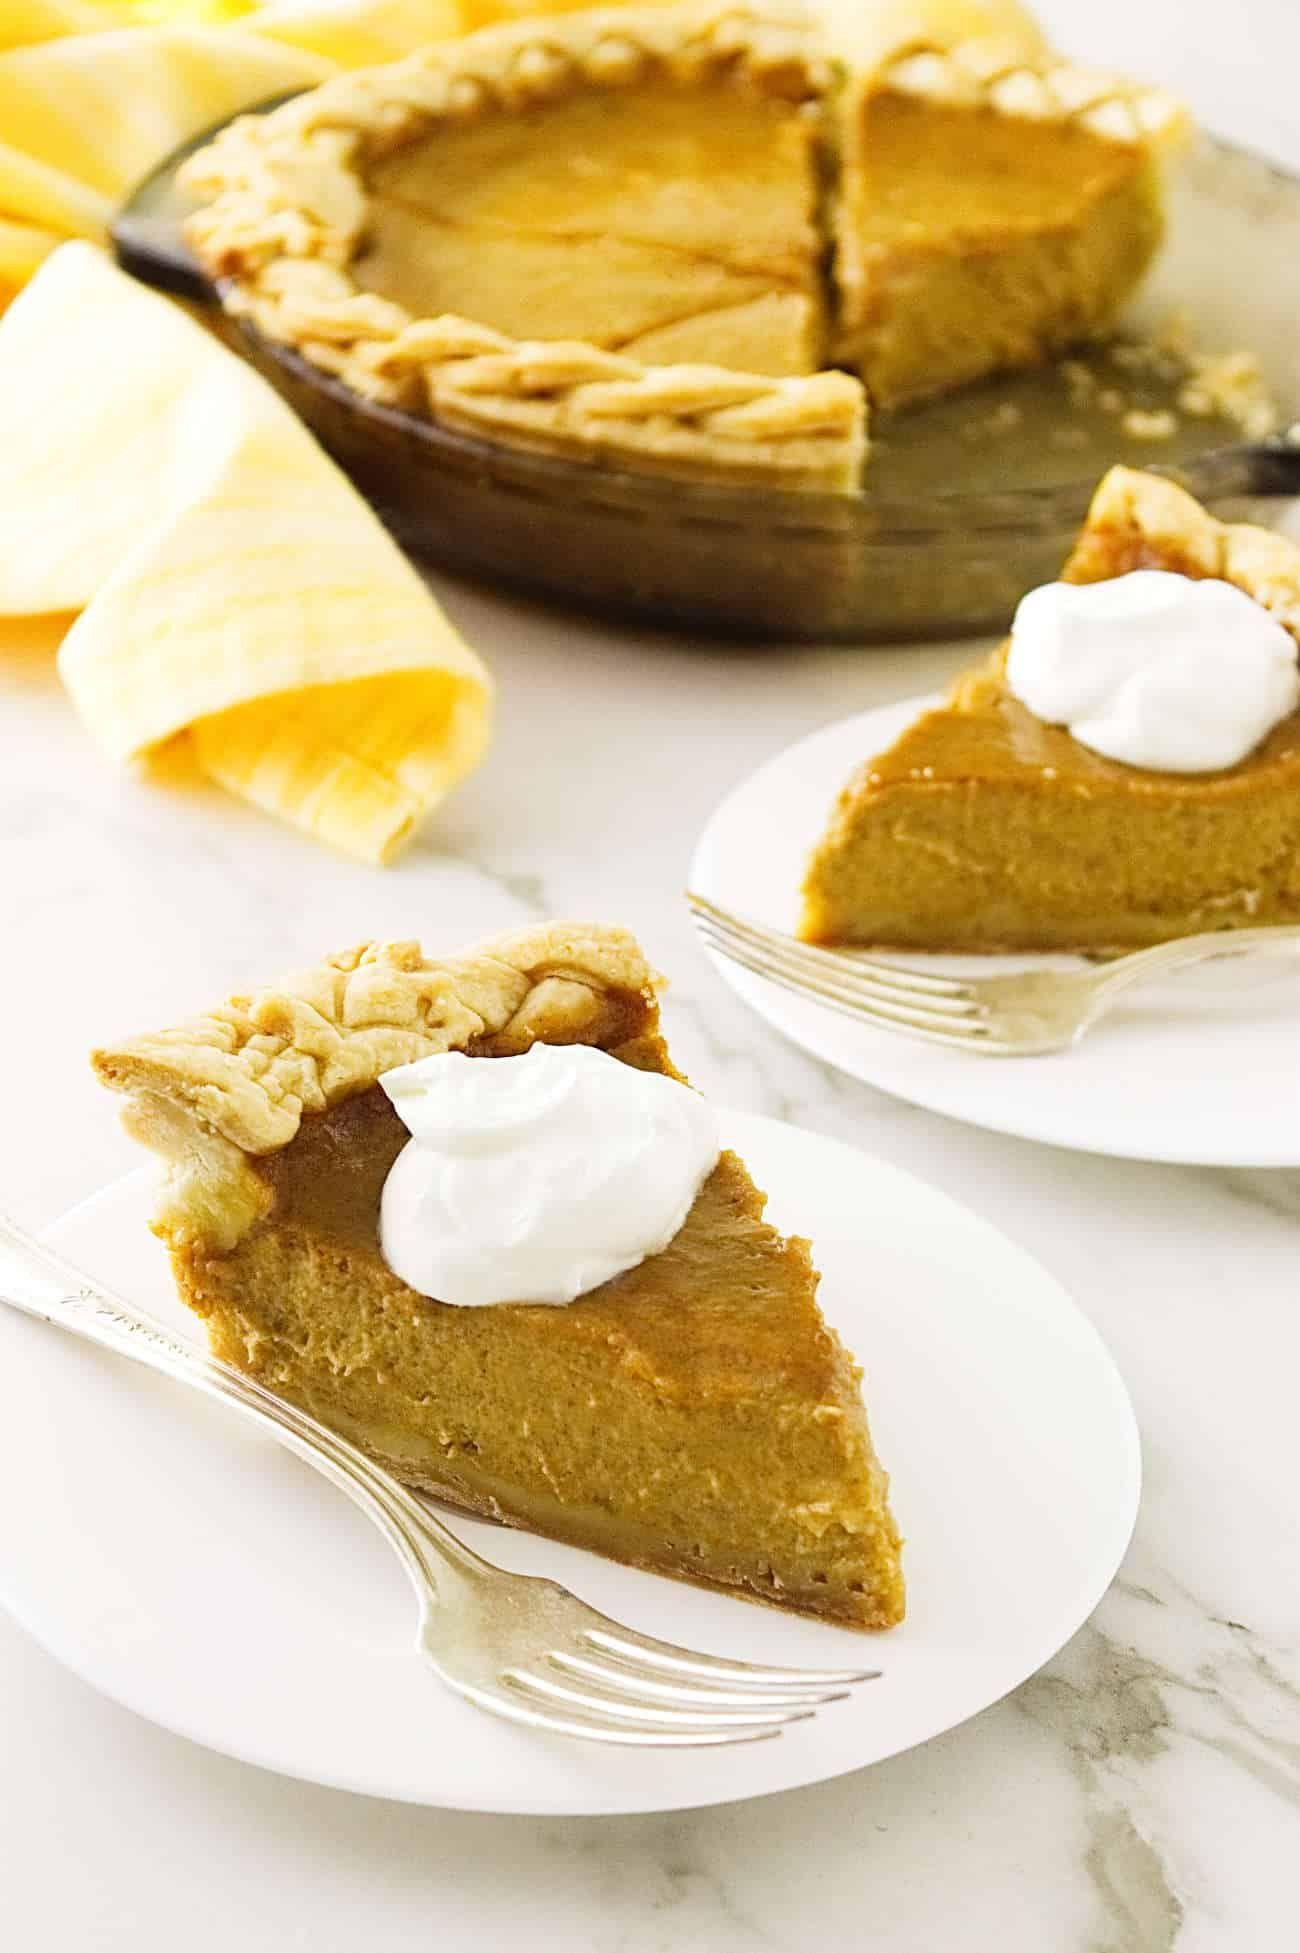 Copycat costco pumpkin pie recipe costco pumpkin pie